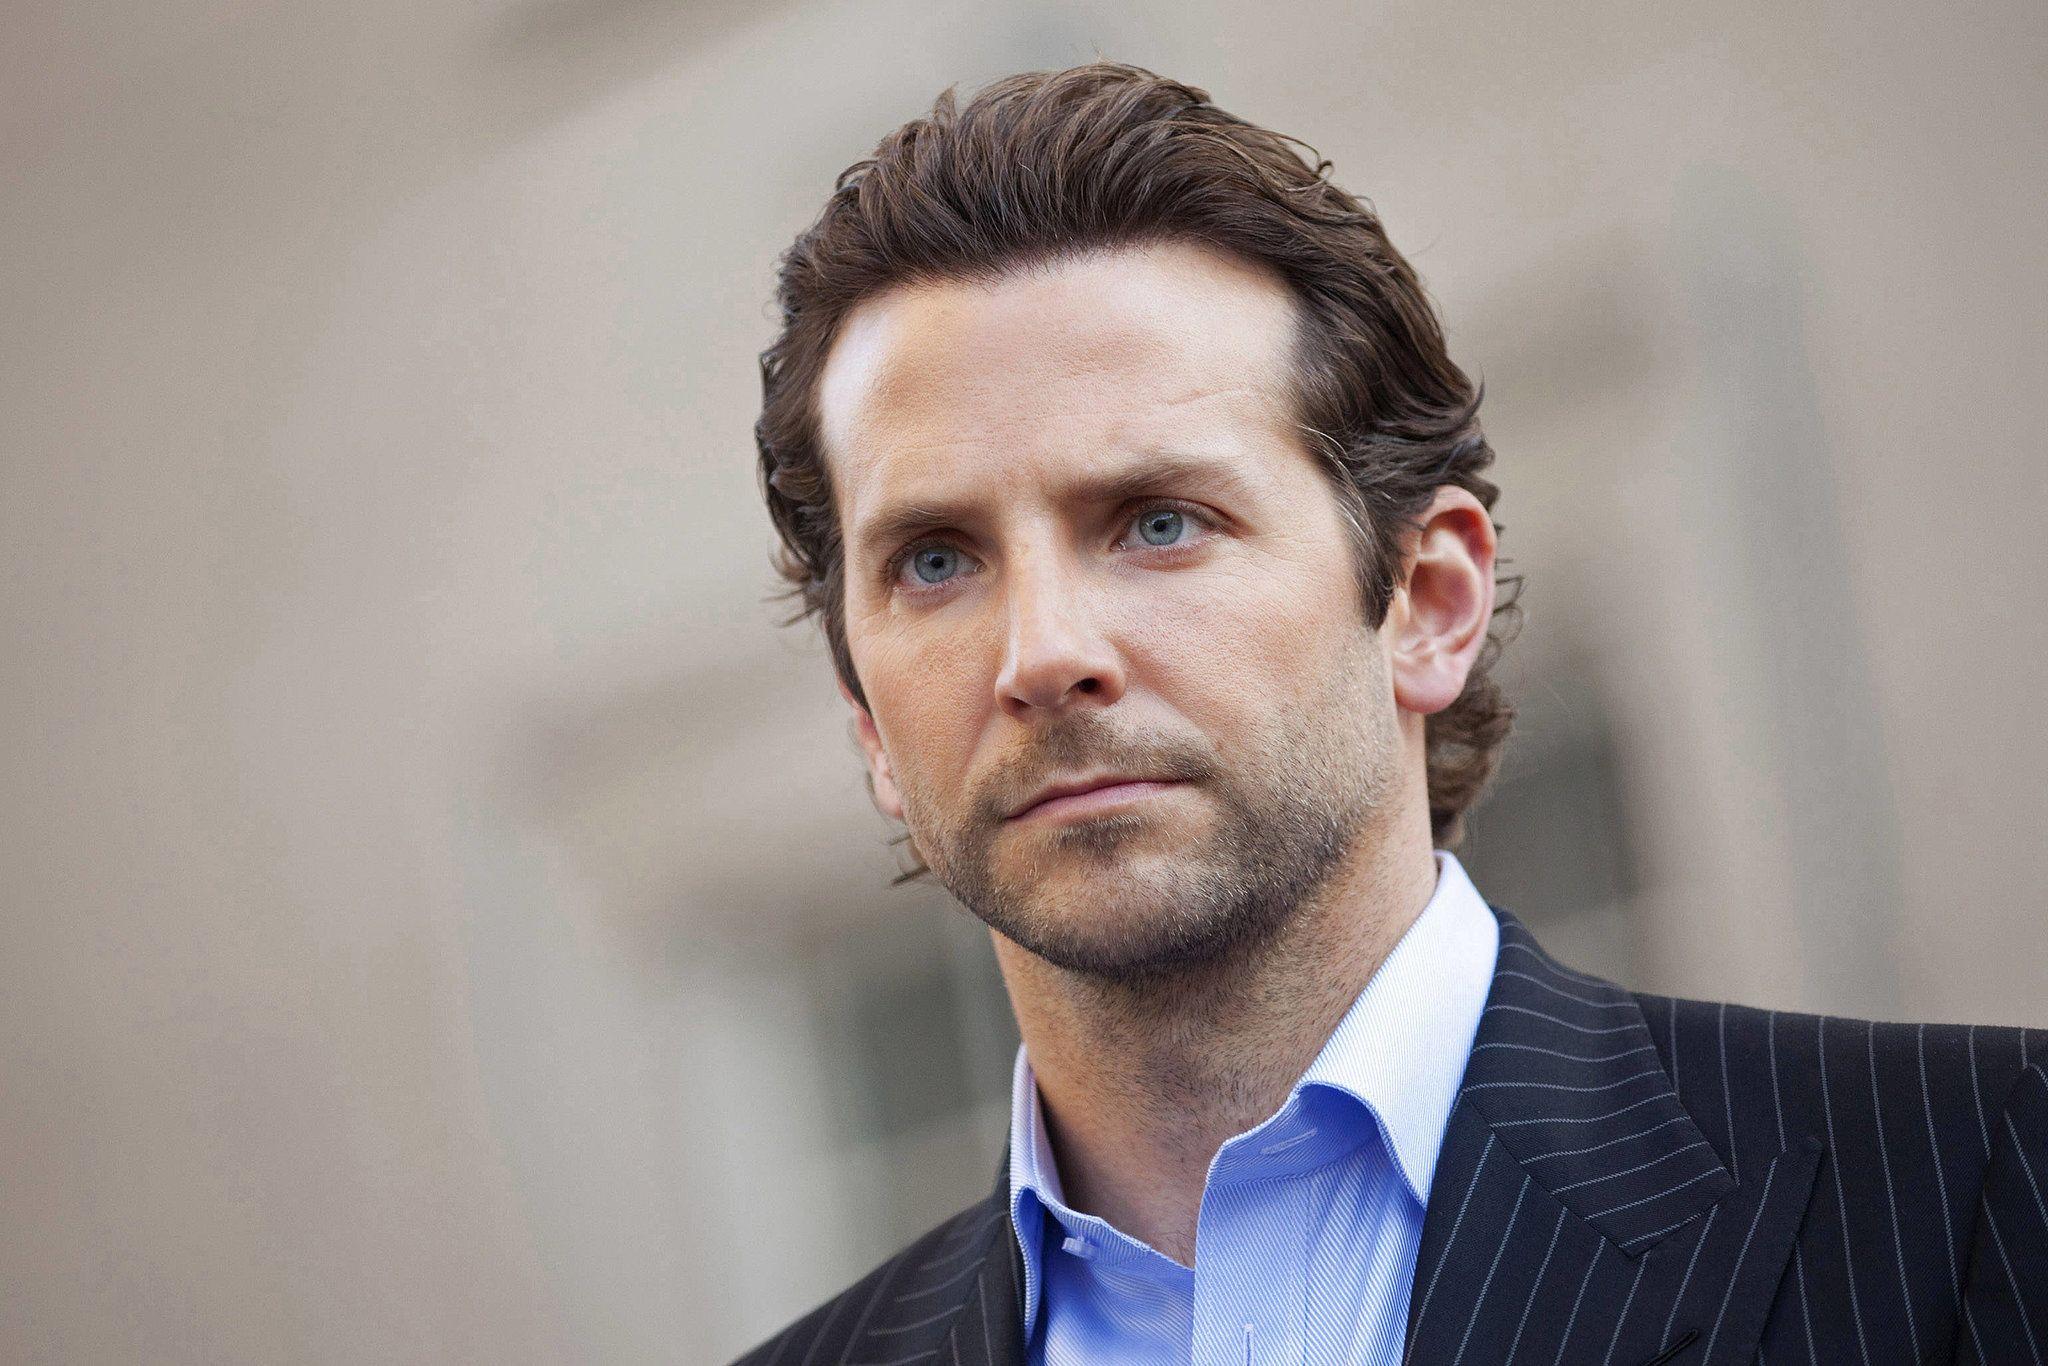 Grosse Manner Haar Trends 2018 Bis Jetzt Wissen Bradley Cooper Hair Mens Haircuts Short Popular Mens Hairstyles